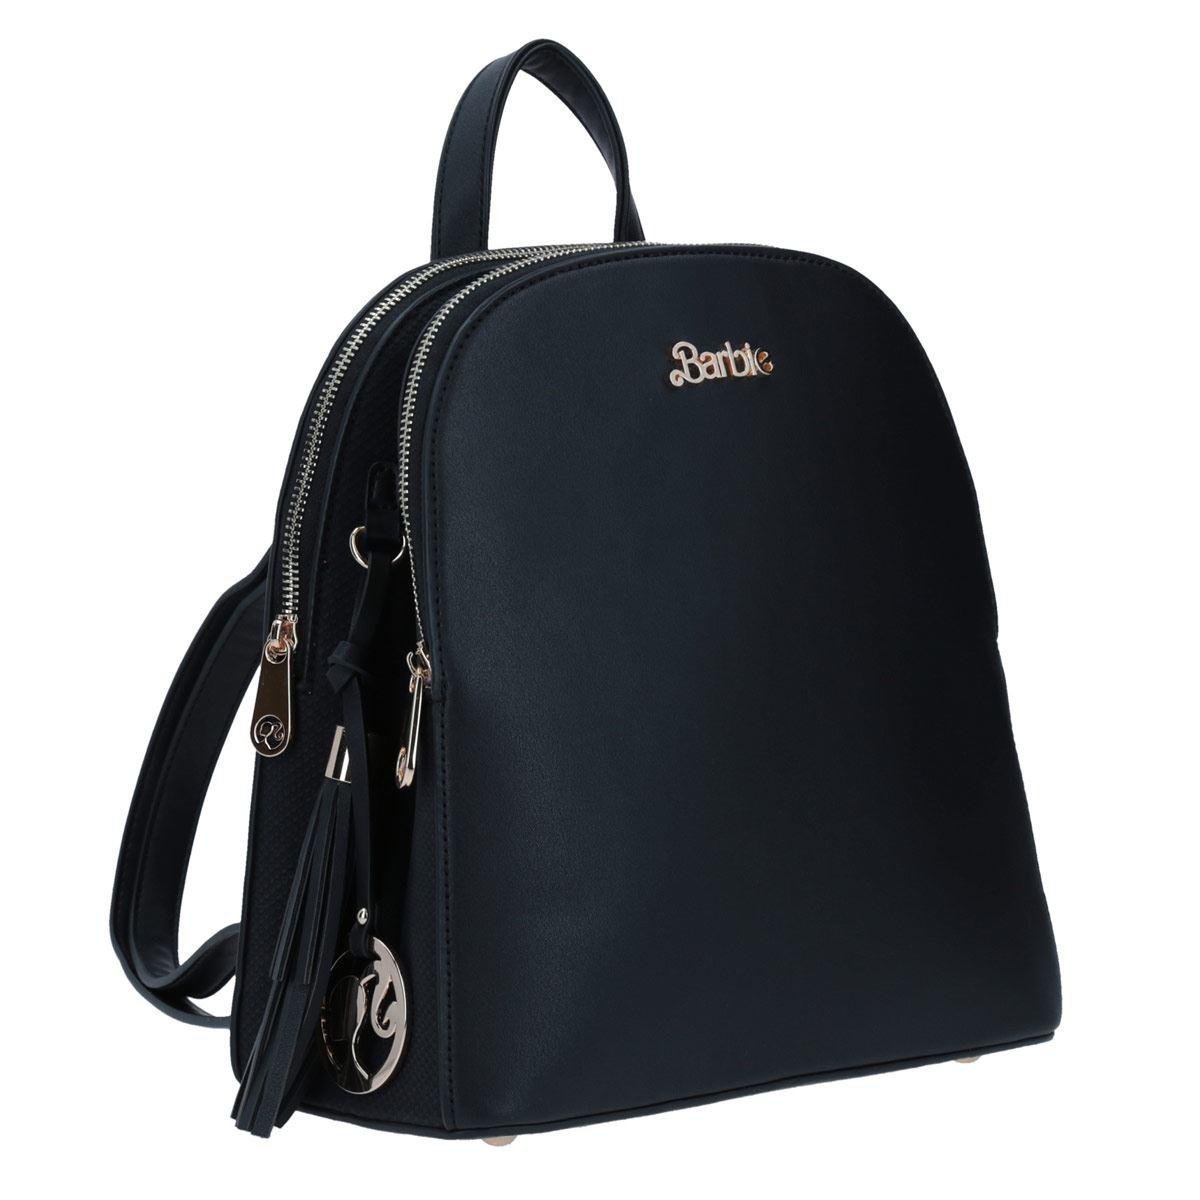 Mochila mediana Barbie x gorett backpack negro GS20259-3